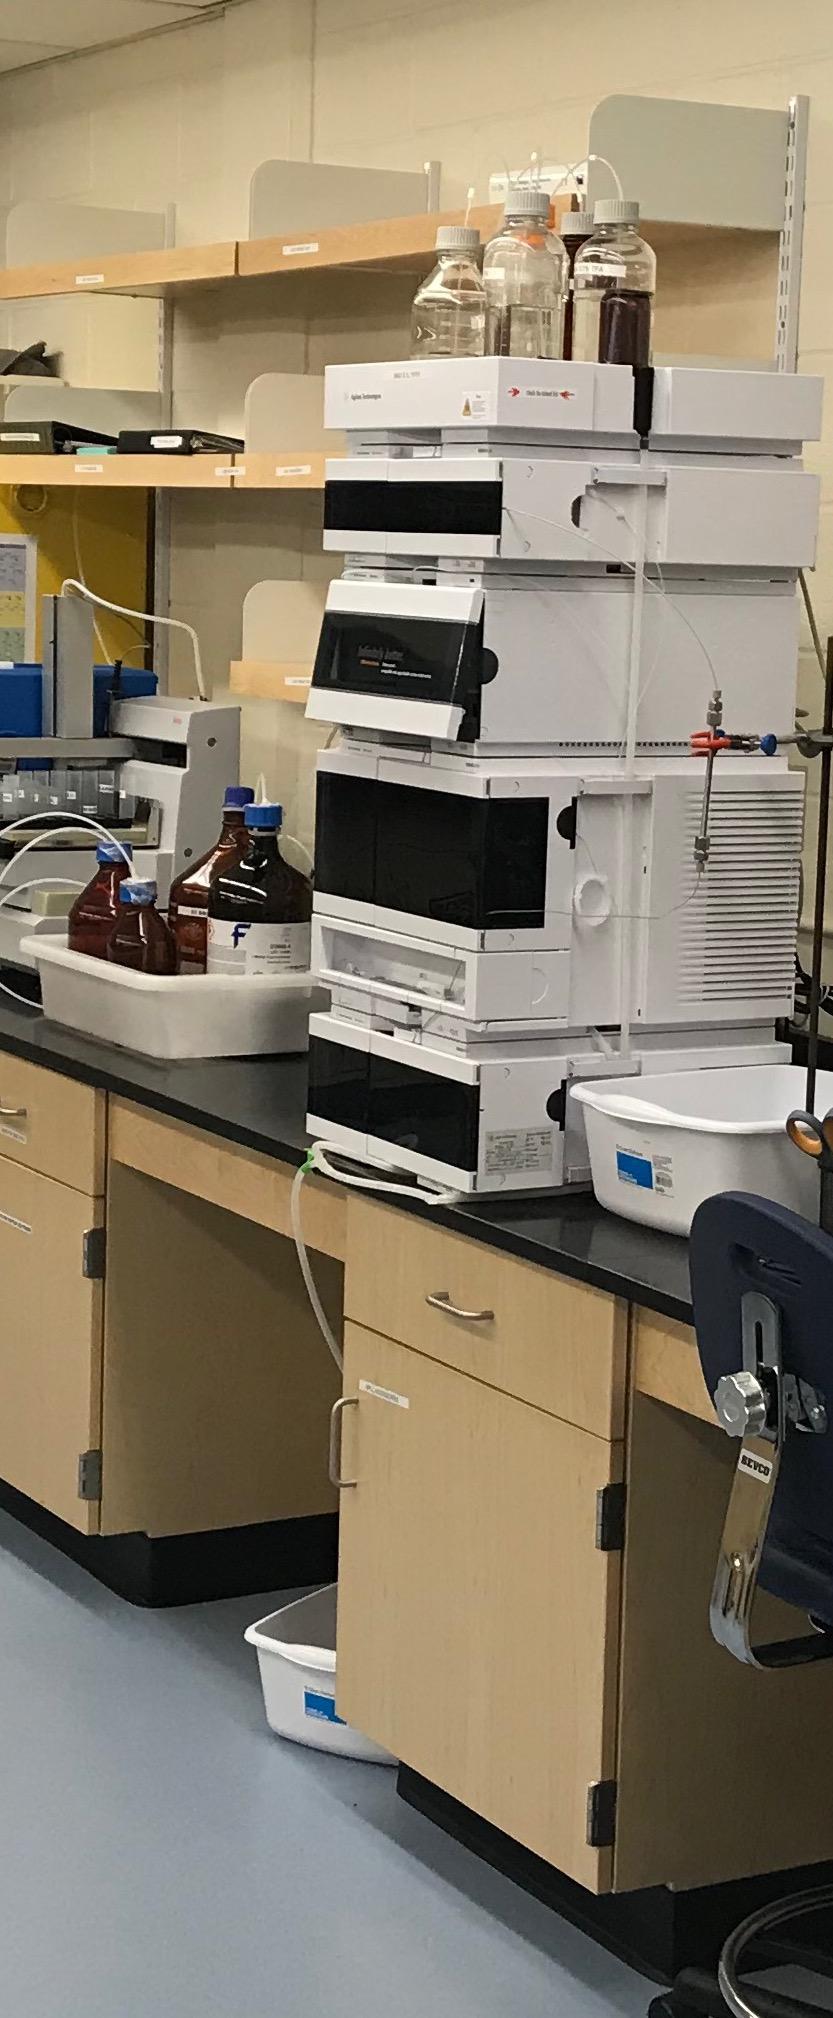 Agilent 1260 Infinity II High Pressure Liquid Chromatography -